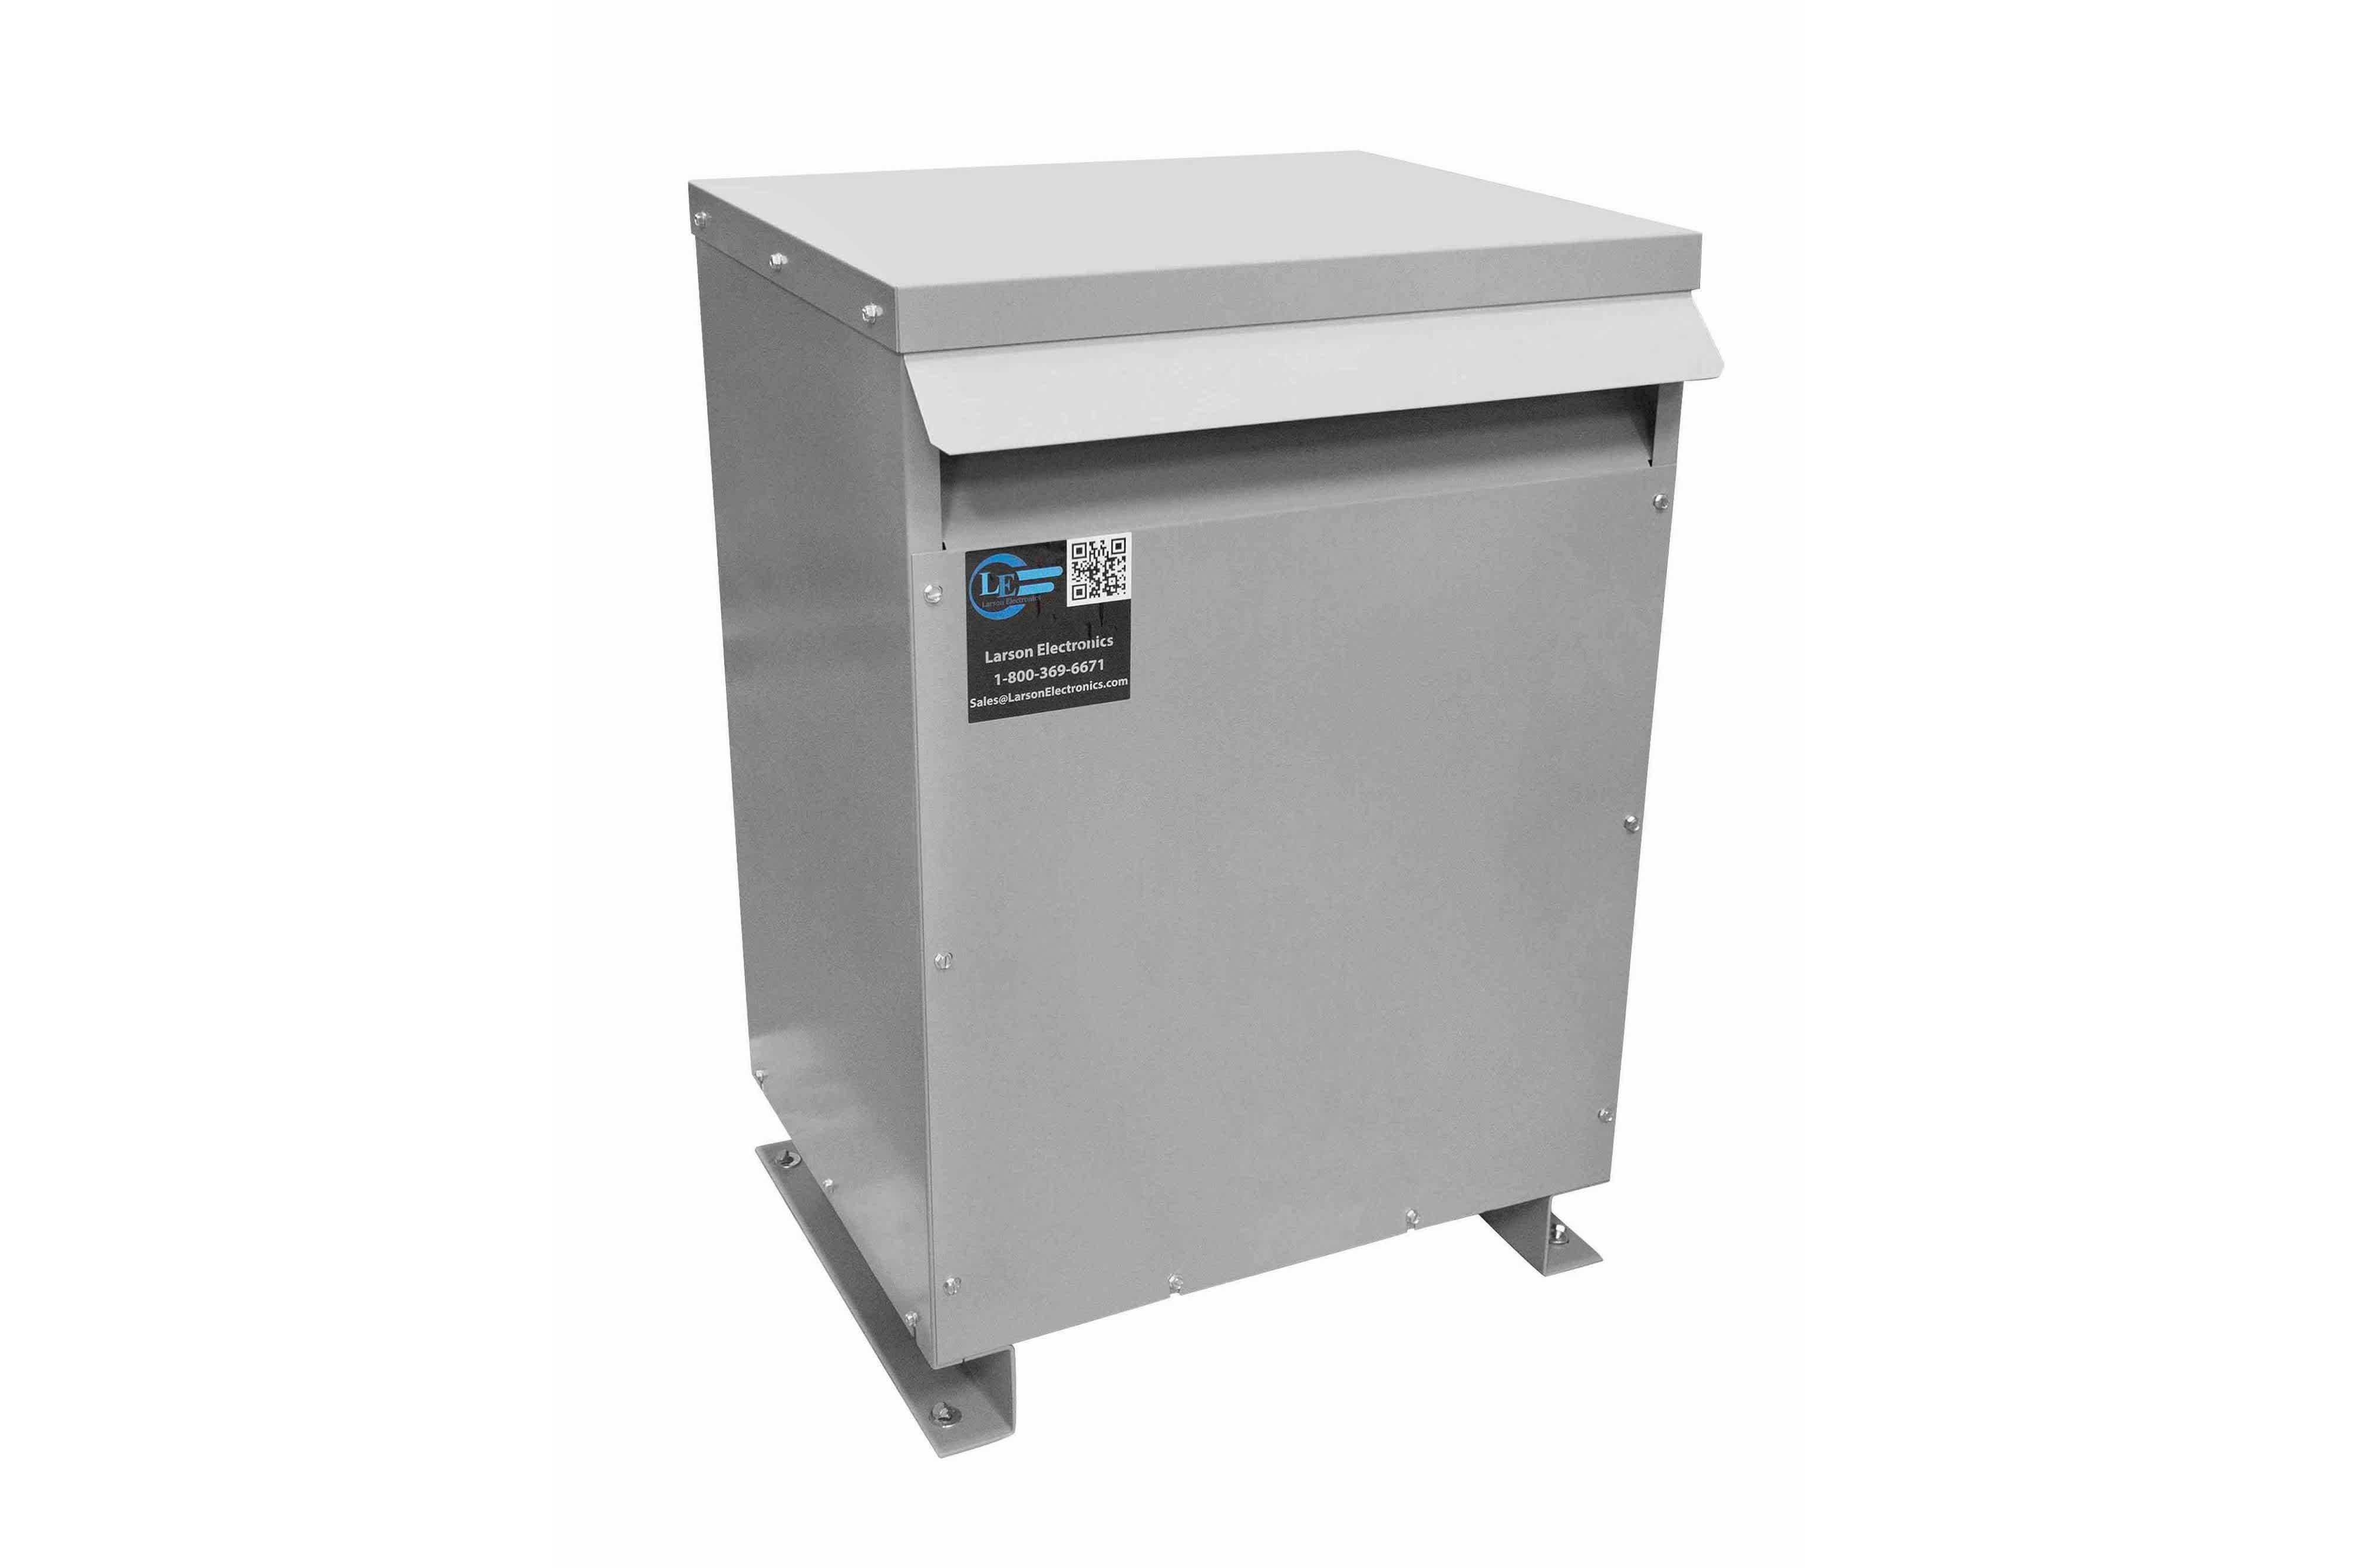 115 kVA 3PH Isolation Transformer, 575V Wye Primary, 240V/120 Delta Secondary, N3R, Ventilated, 60 Hz